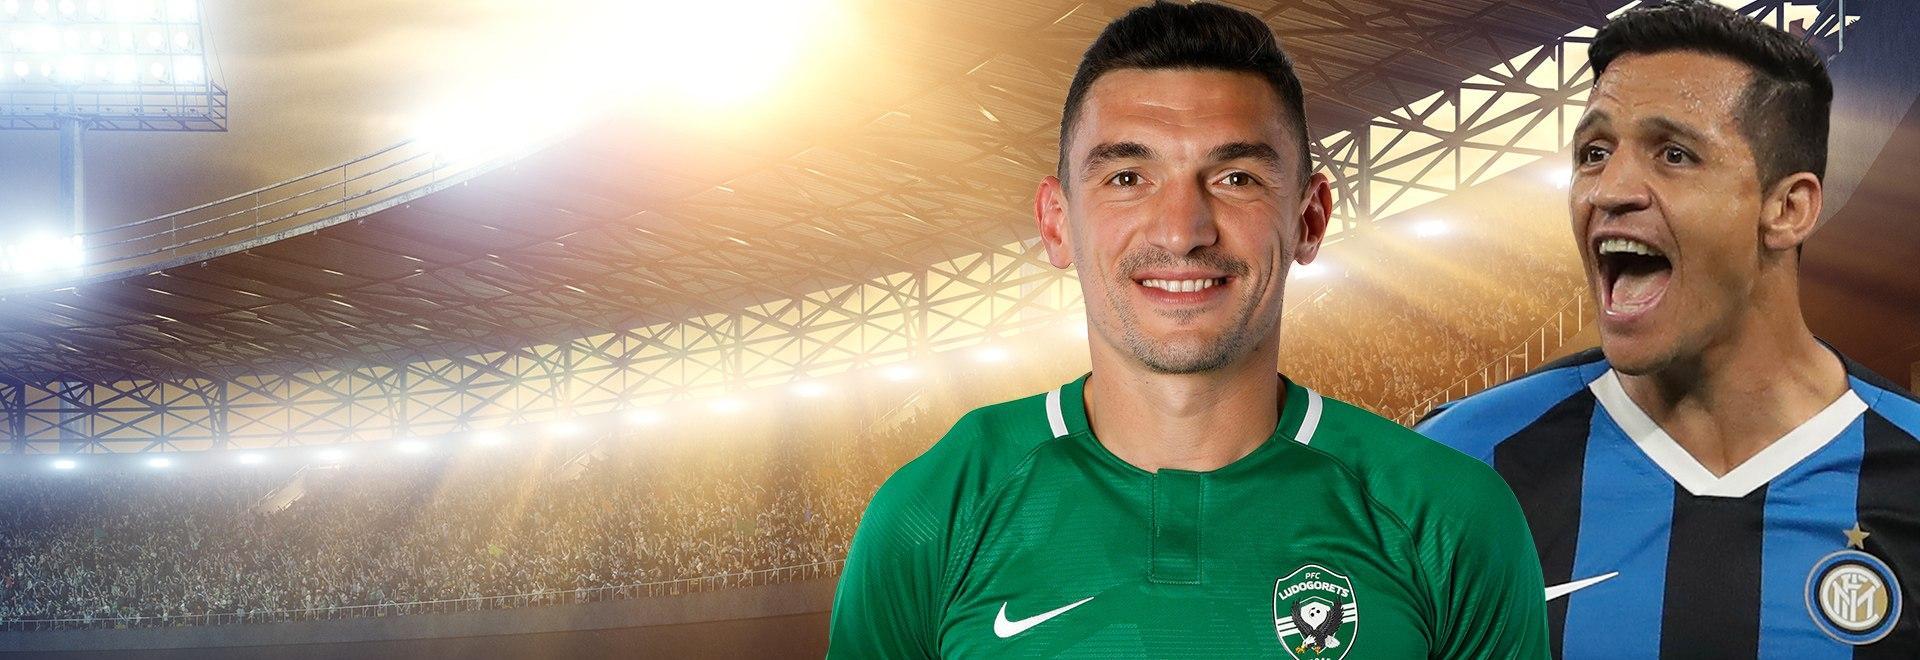 Ludogorets - Inter. Sedicesimi Andata